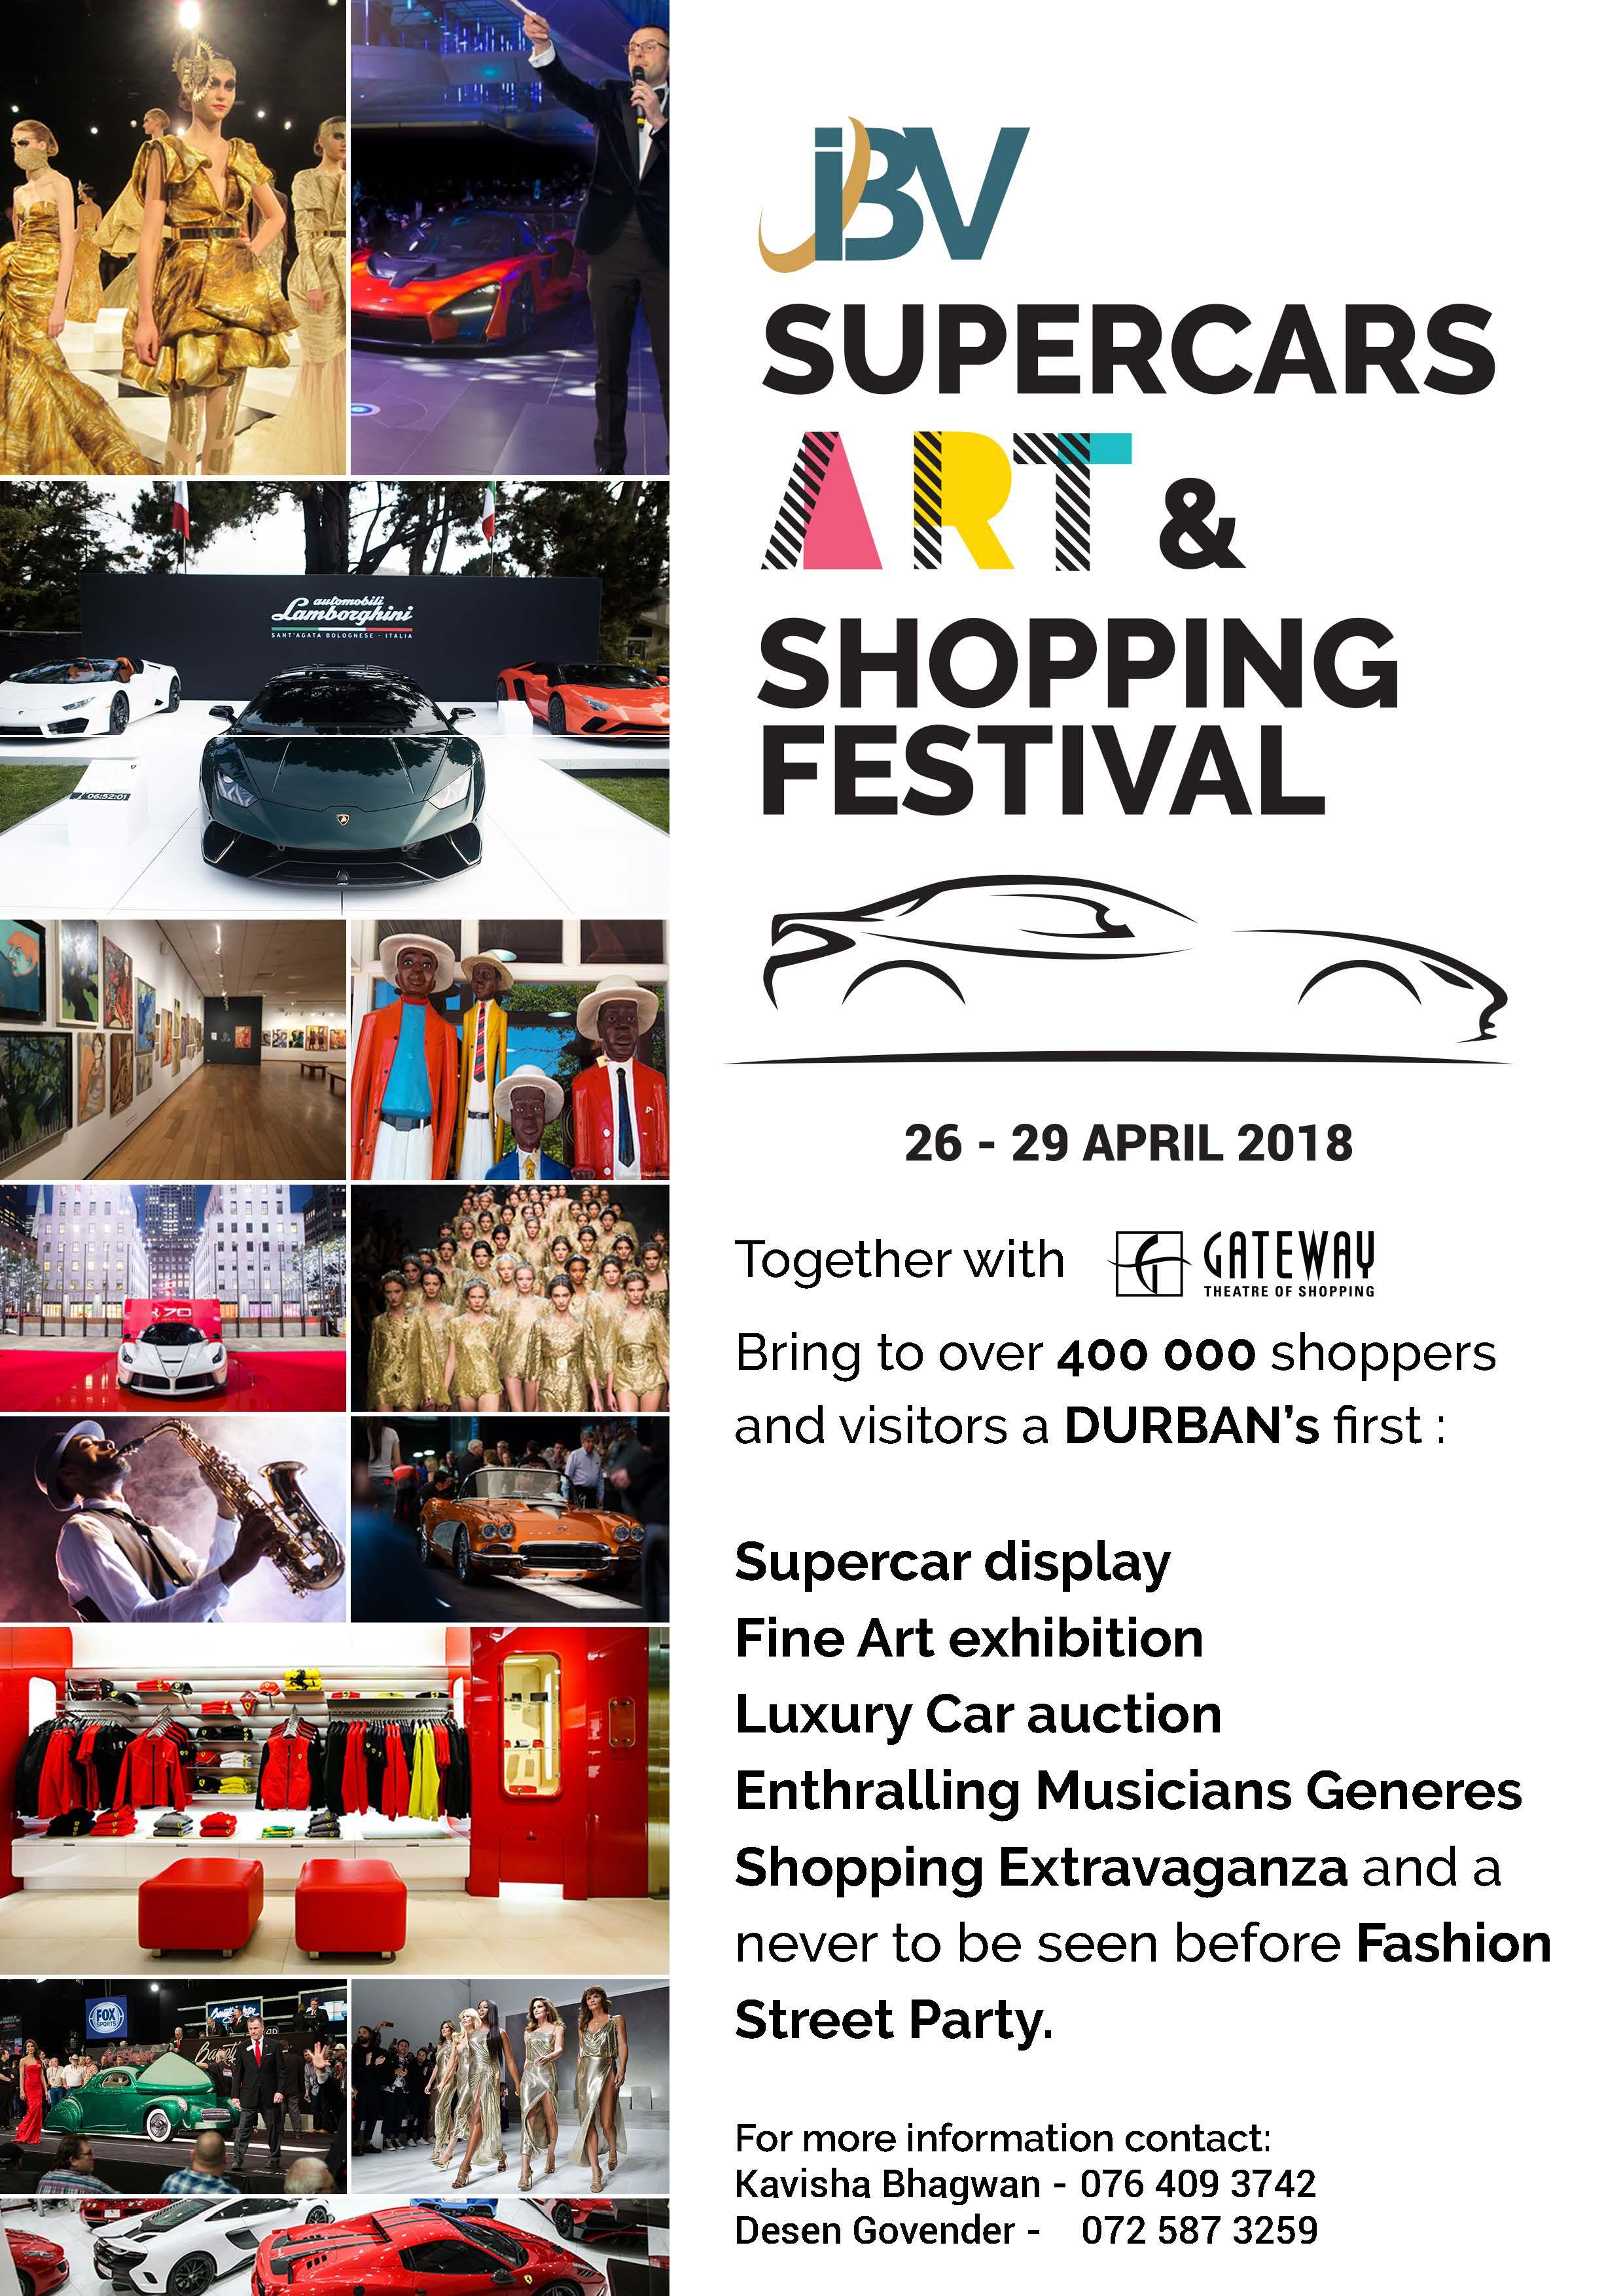 IBV Supercars, Art and Shopping Festival